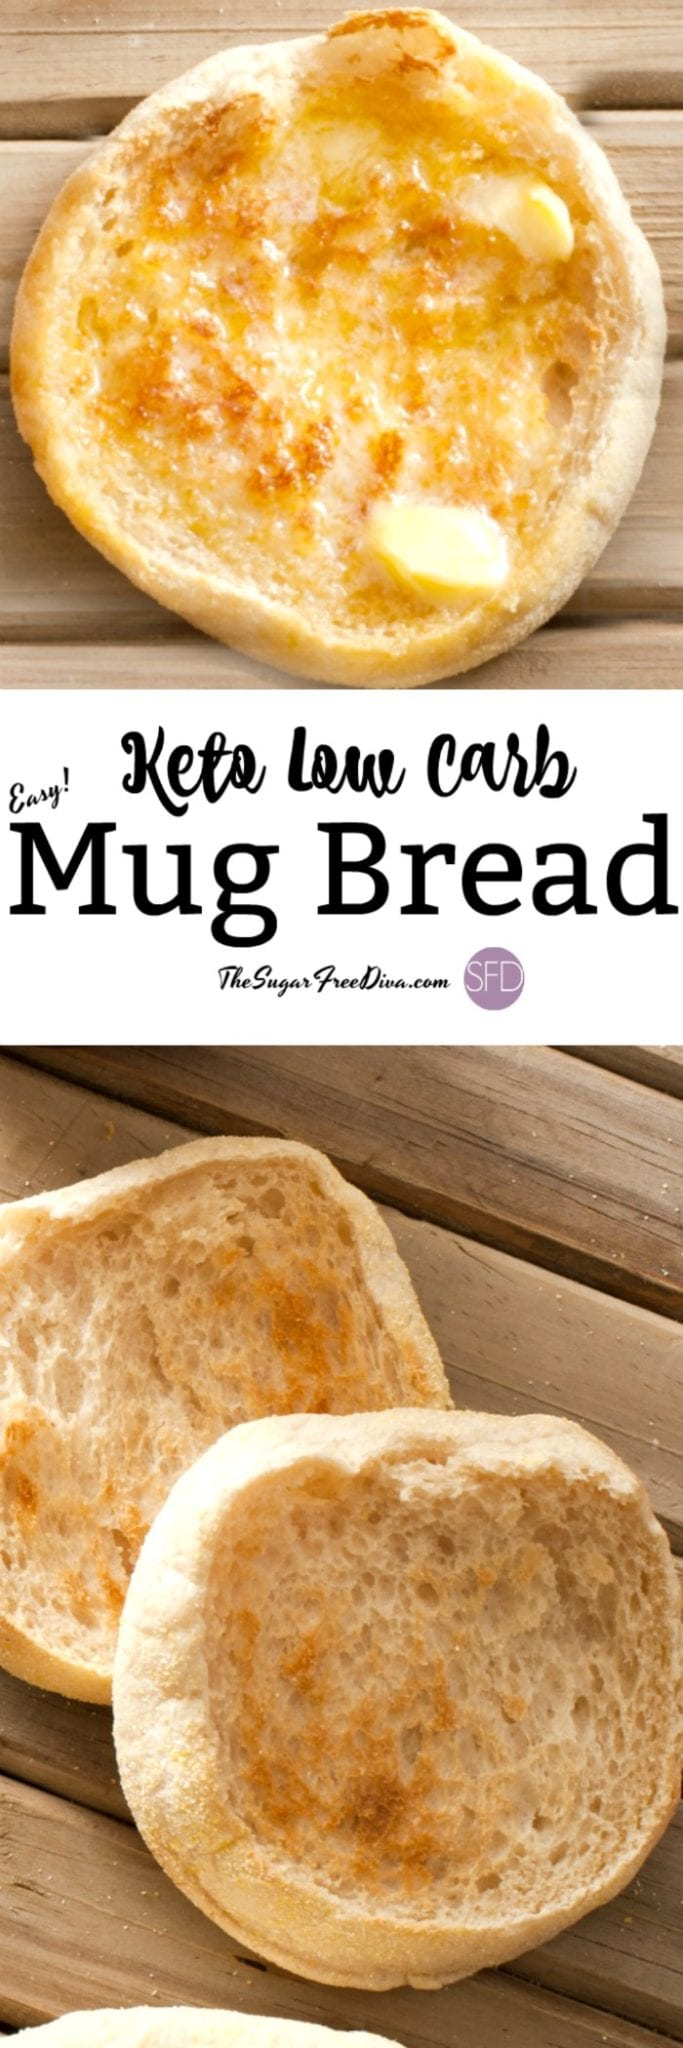 Easy And Yummy Keto Low Carb Mug Bread Recipe